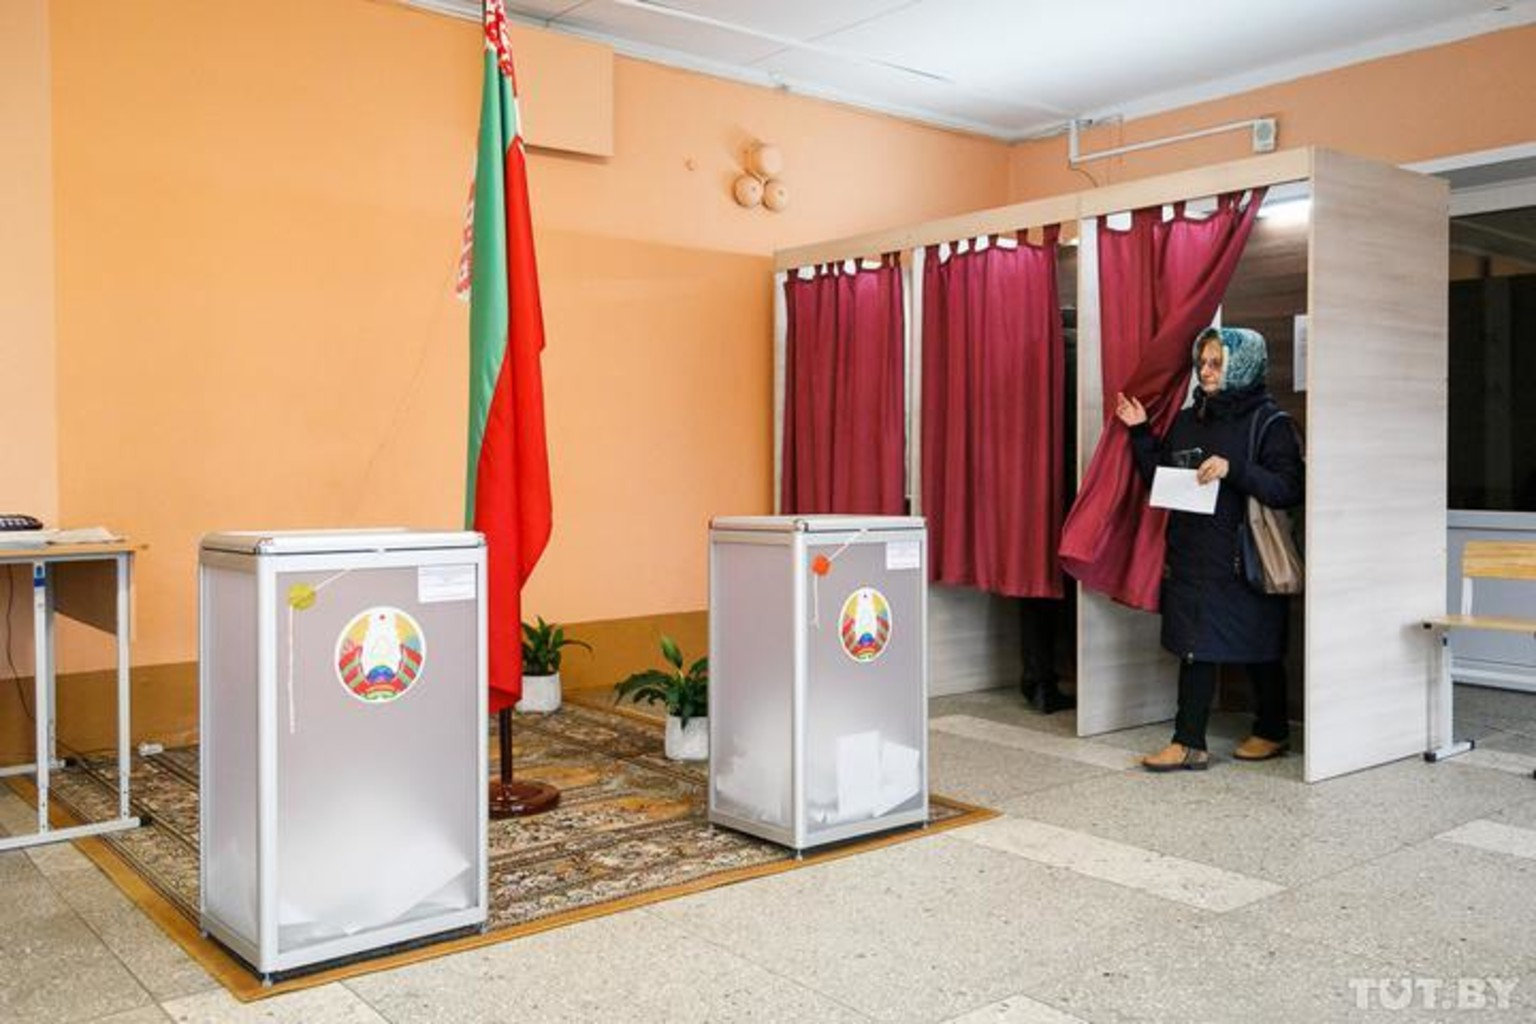 Vybory 20191117 shuk tutby phsl 5441